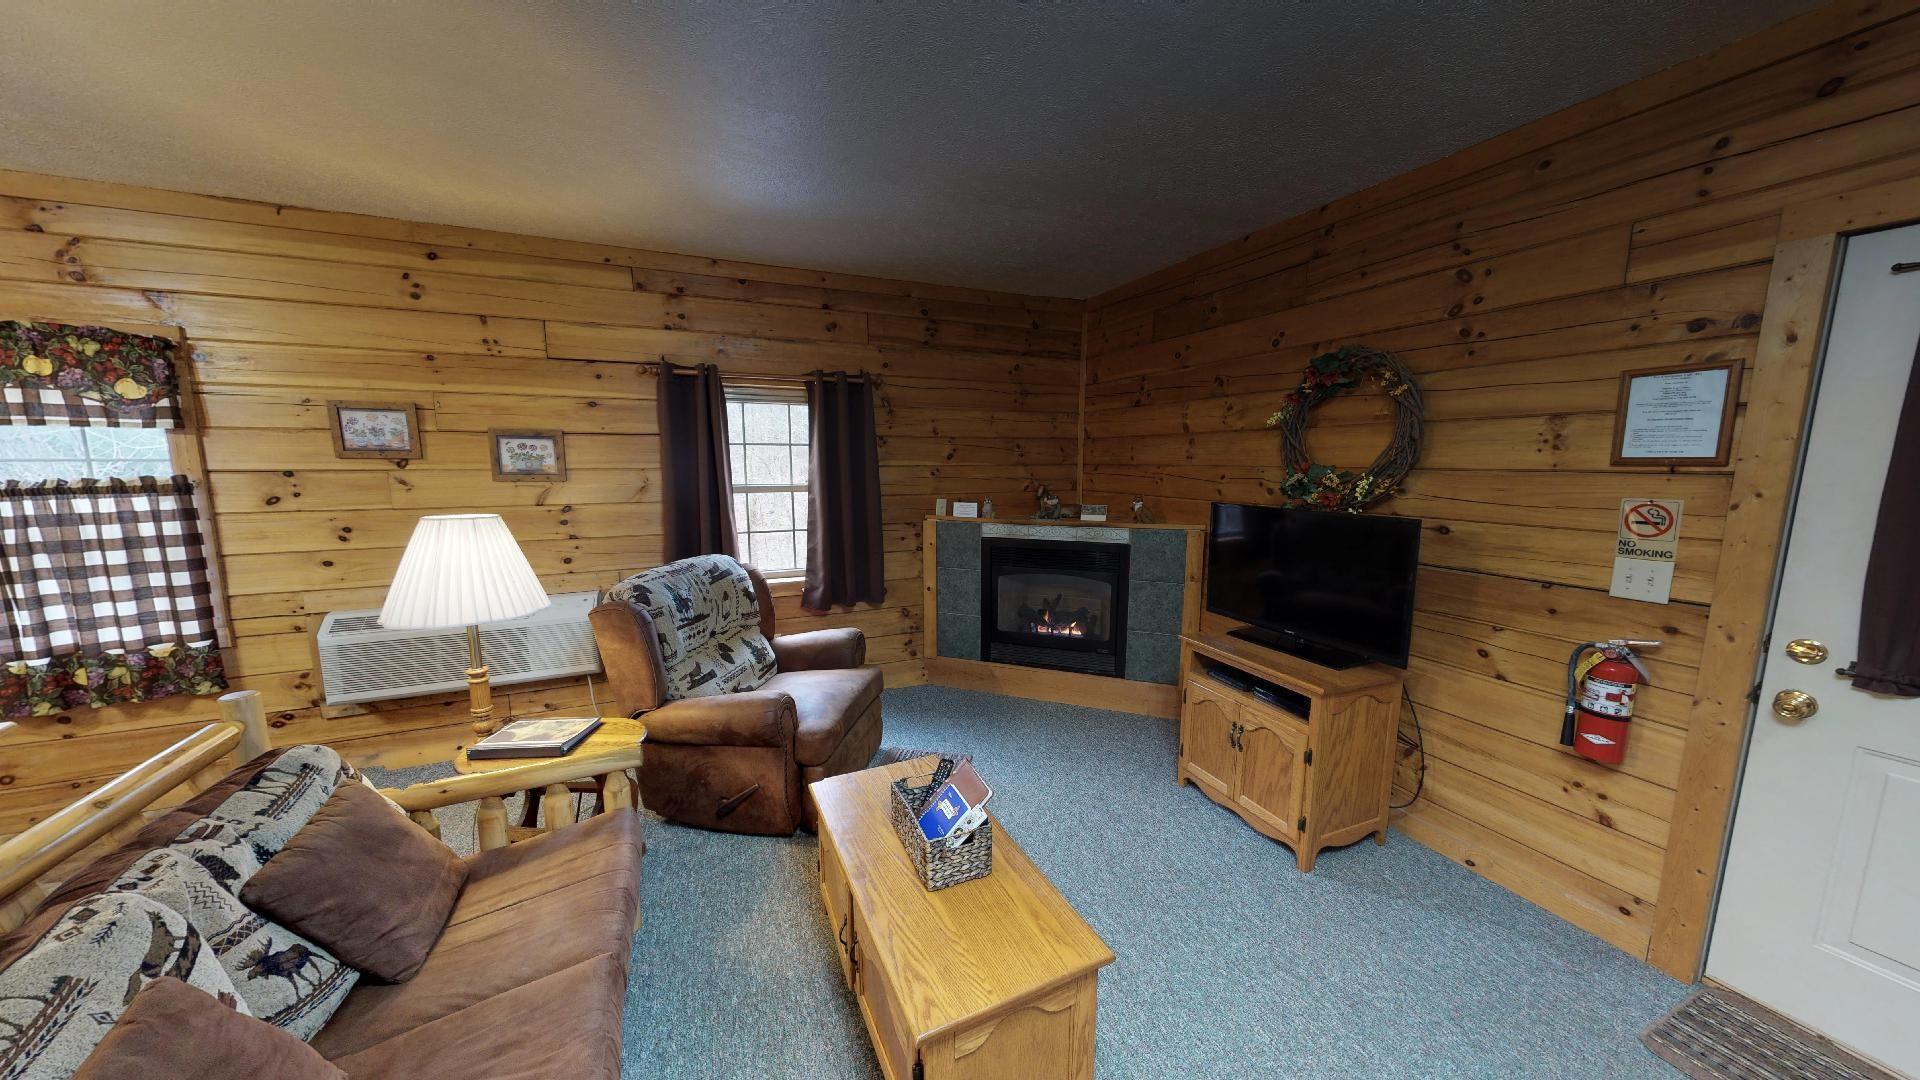 Briarwood Couples Cabin - Living Room. DirecTV gas log fireplace.